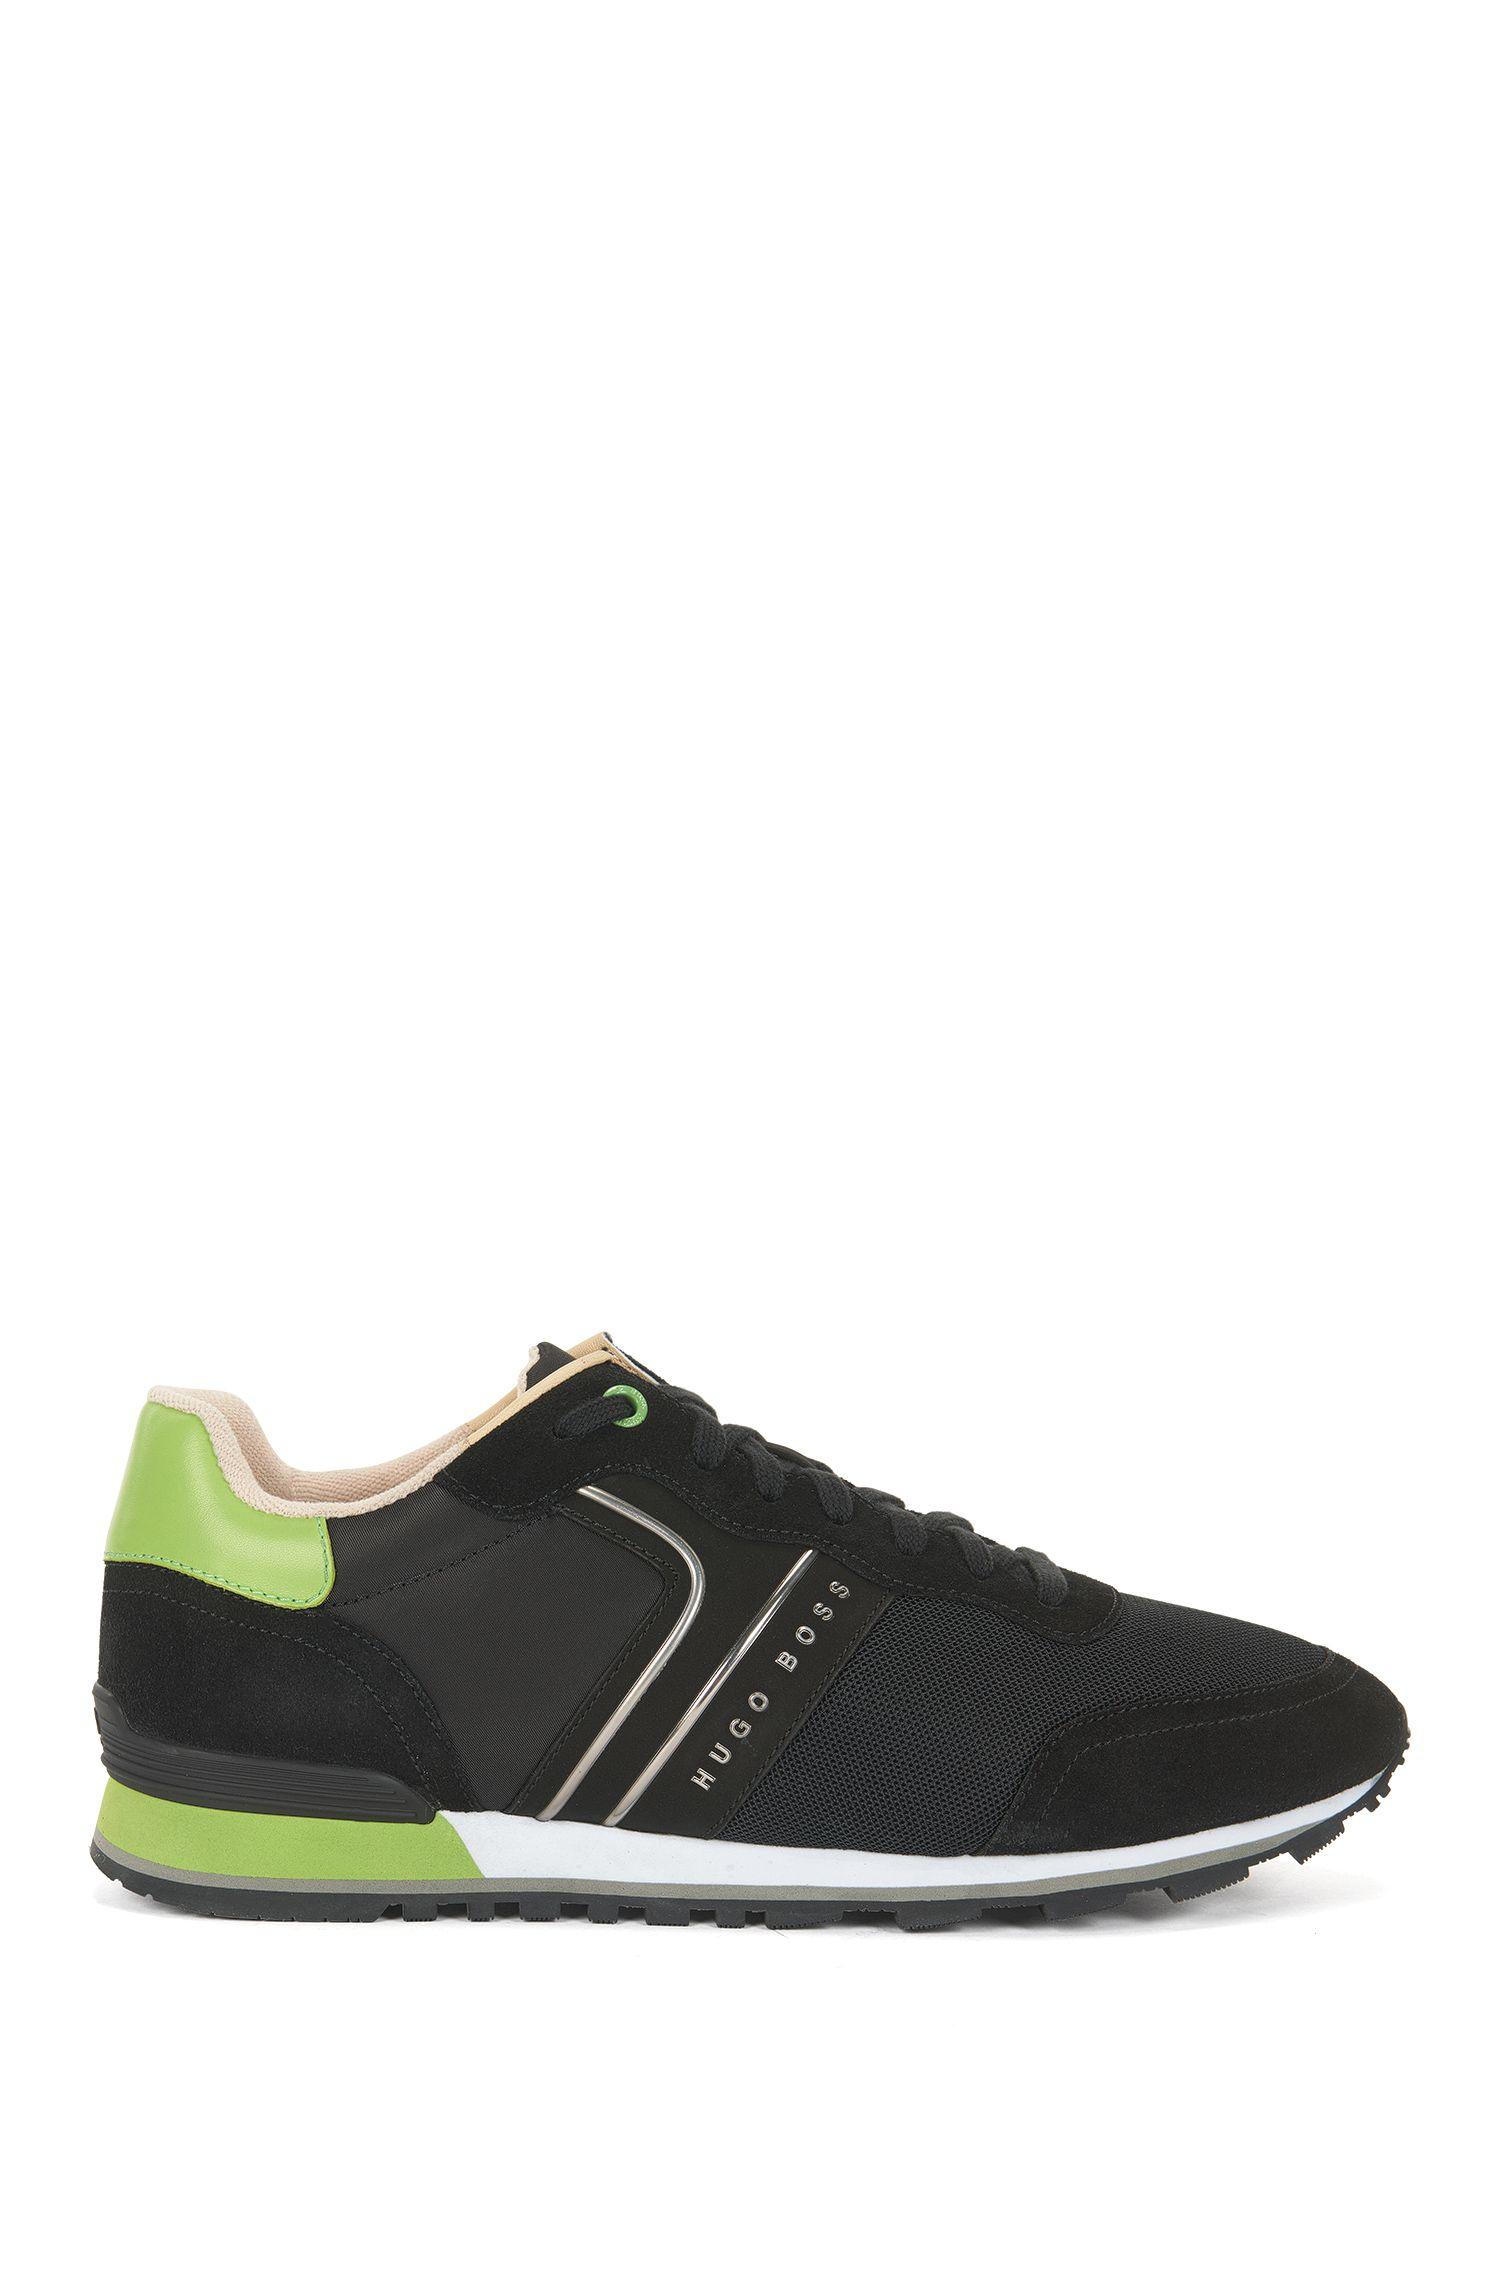 Suede Sneaker | Parkour Runn Nymx